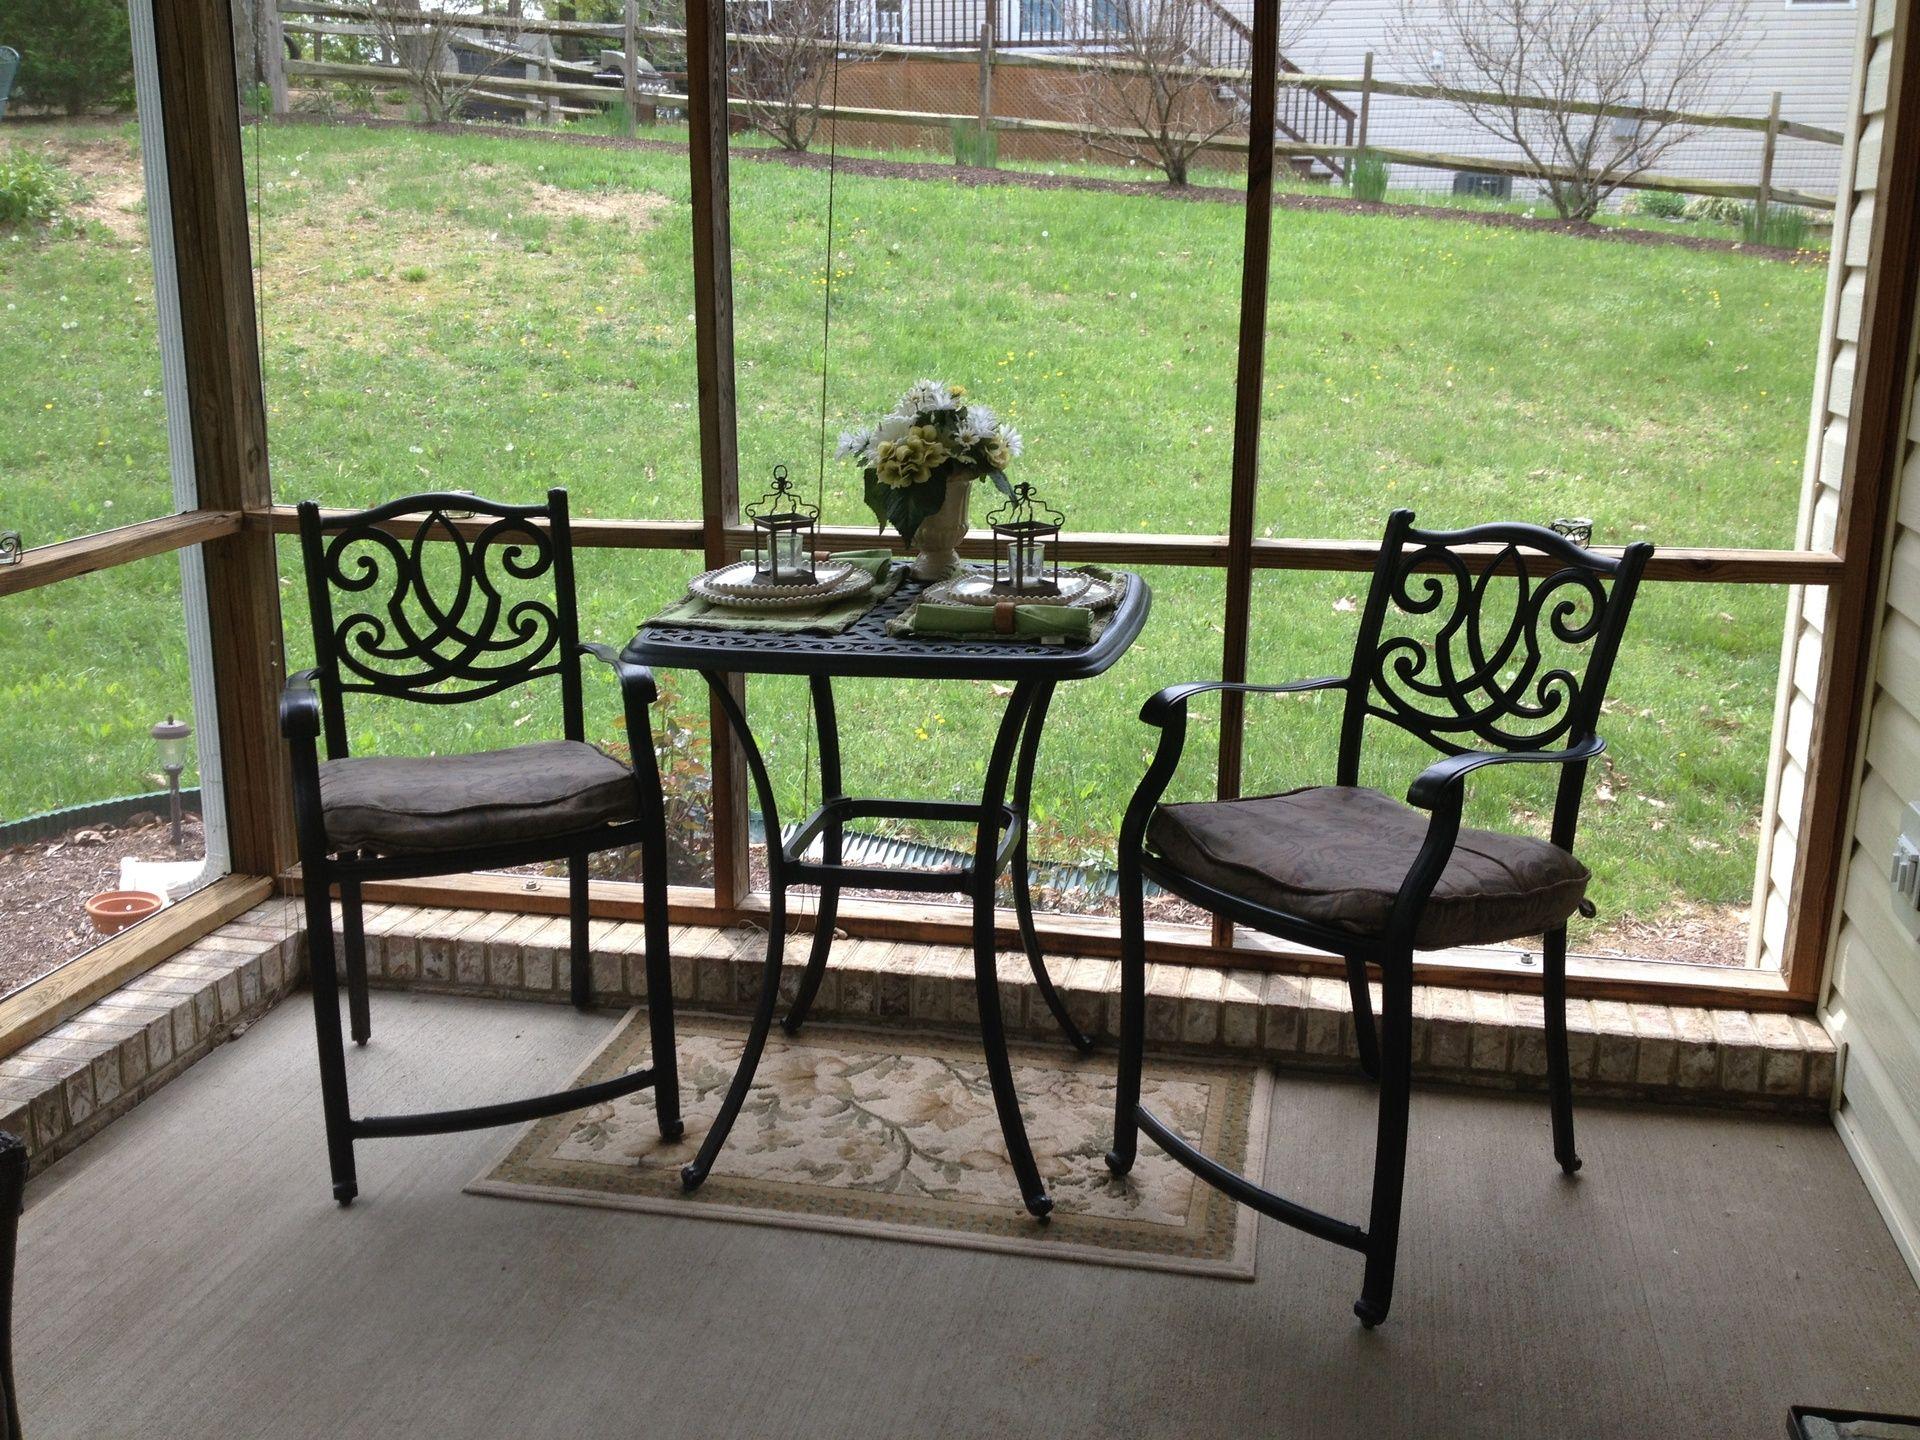 Outdoor Living - Spring Has Sprung! | Outdoor living ...